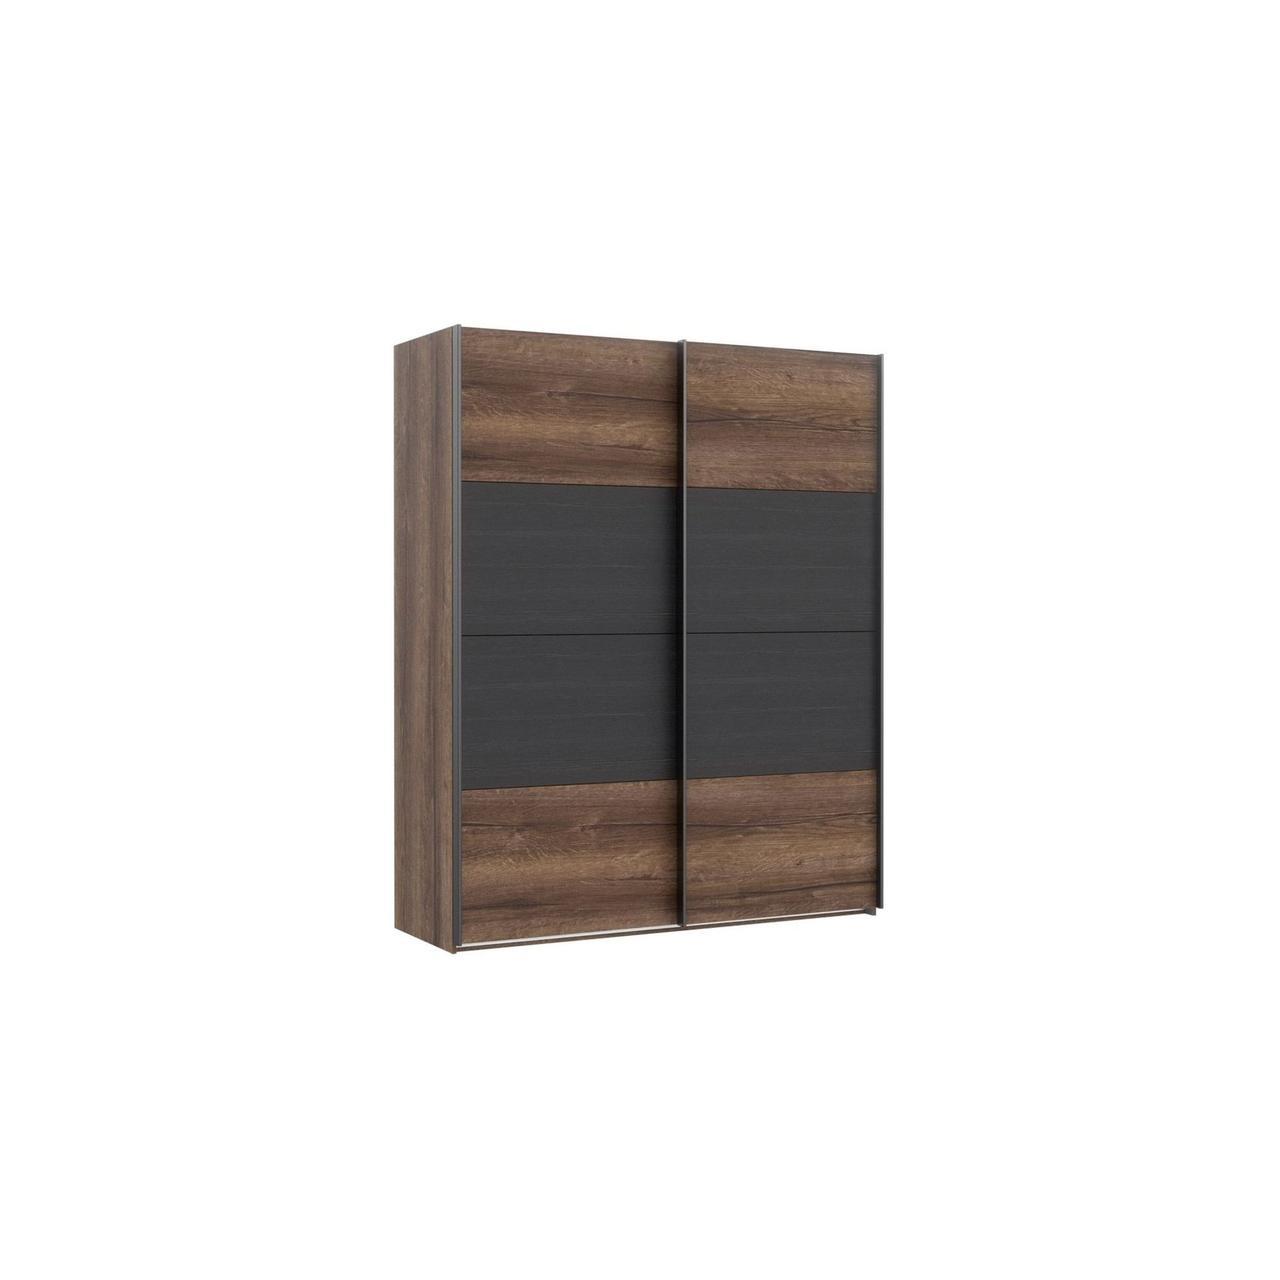 Шкаф RMRS824E1-N09 DREAMER Forte дуб благородный/черный